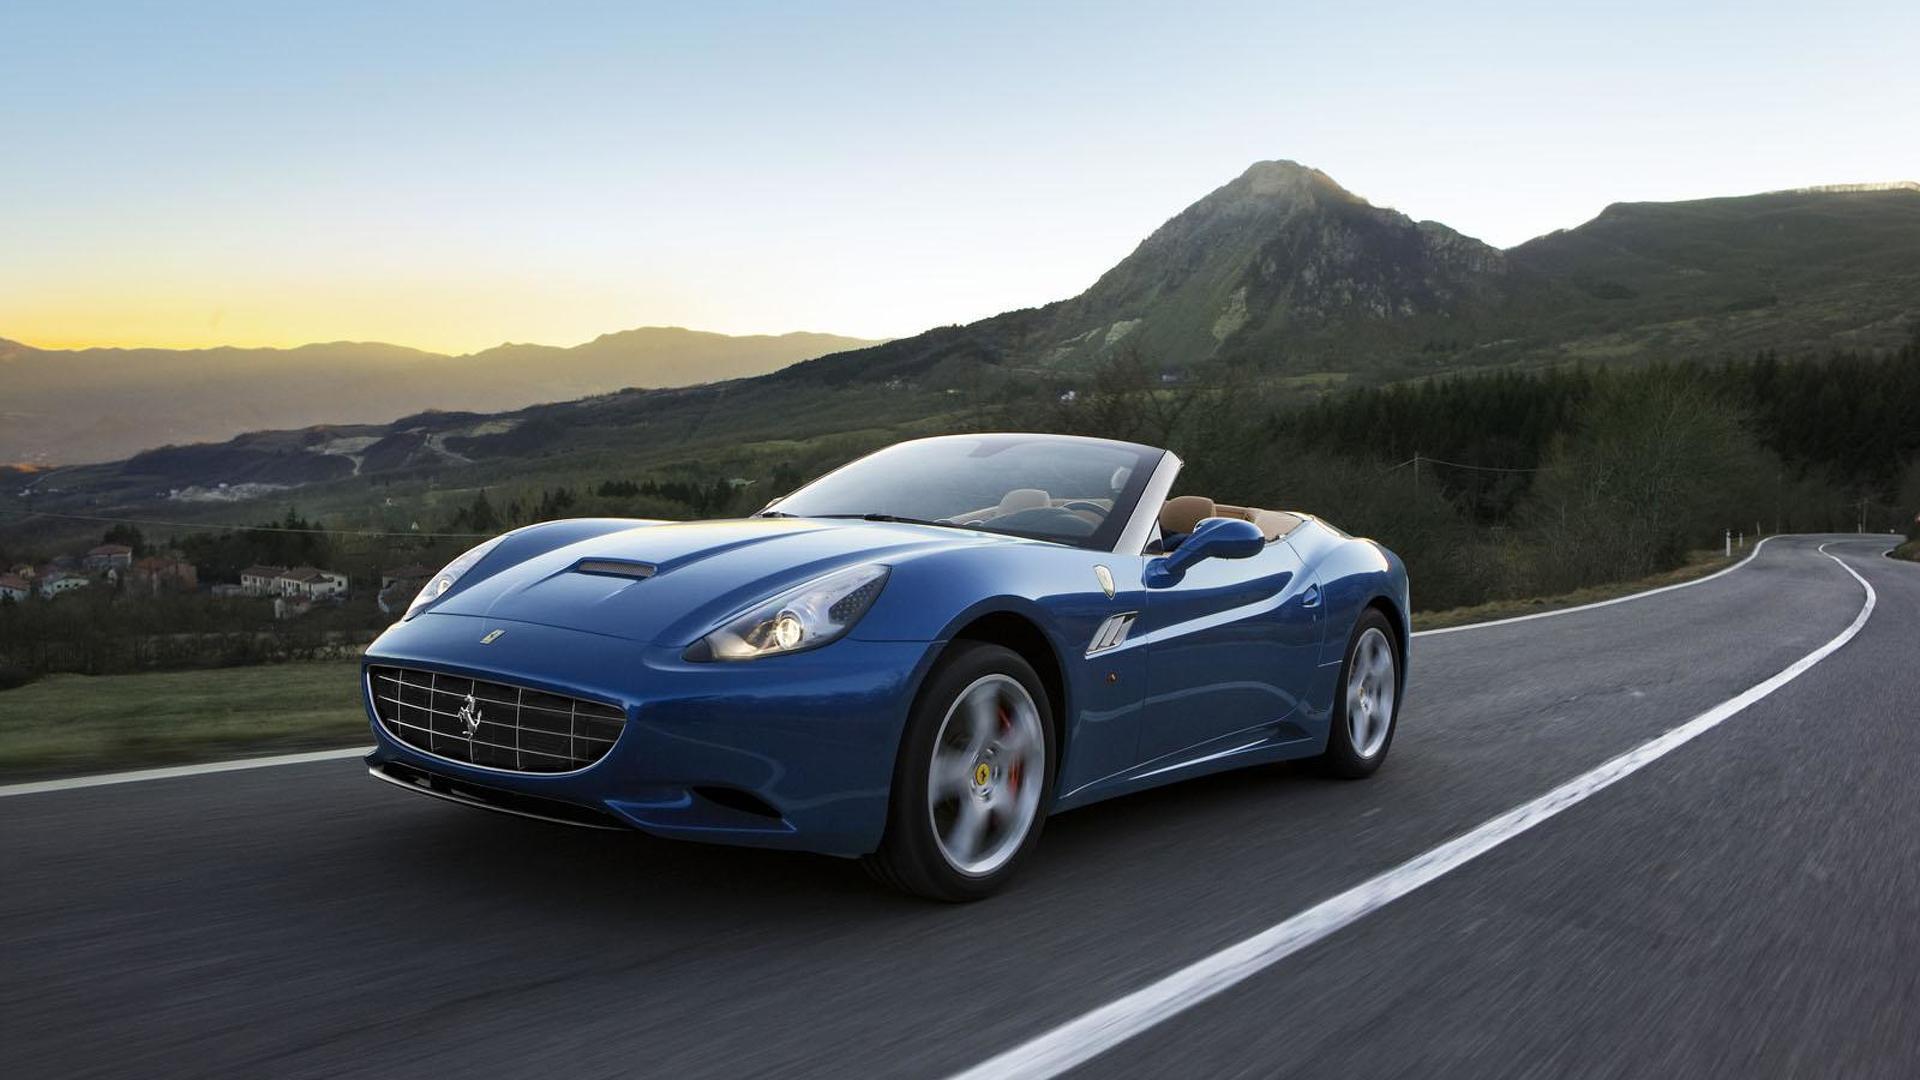 Next-gen Ferrari California could go turbo